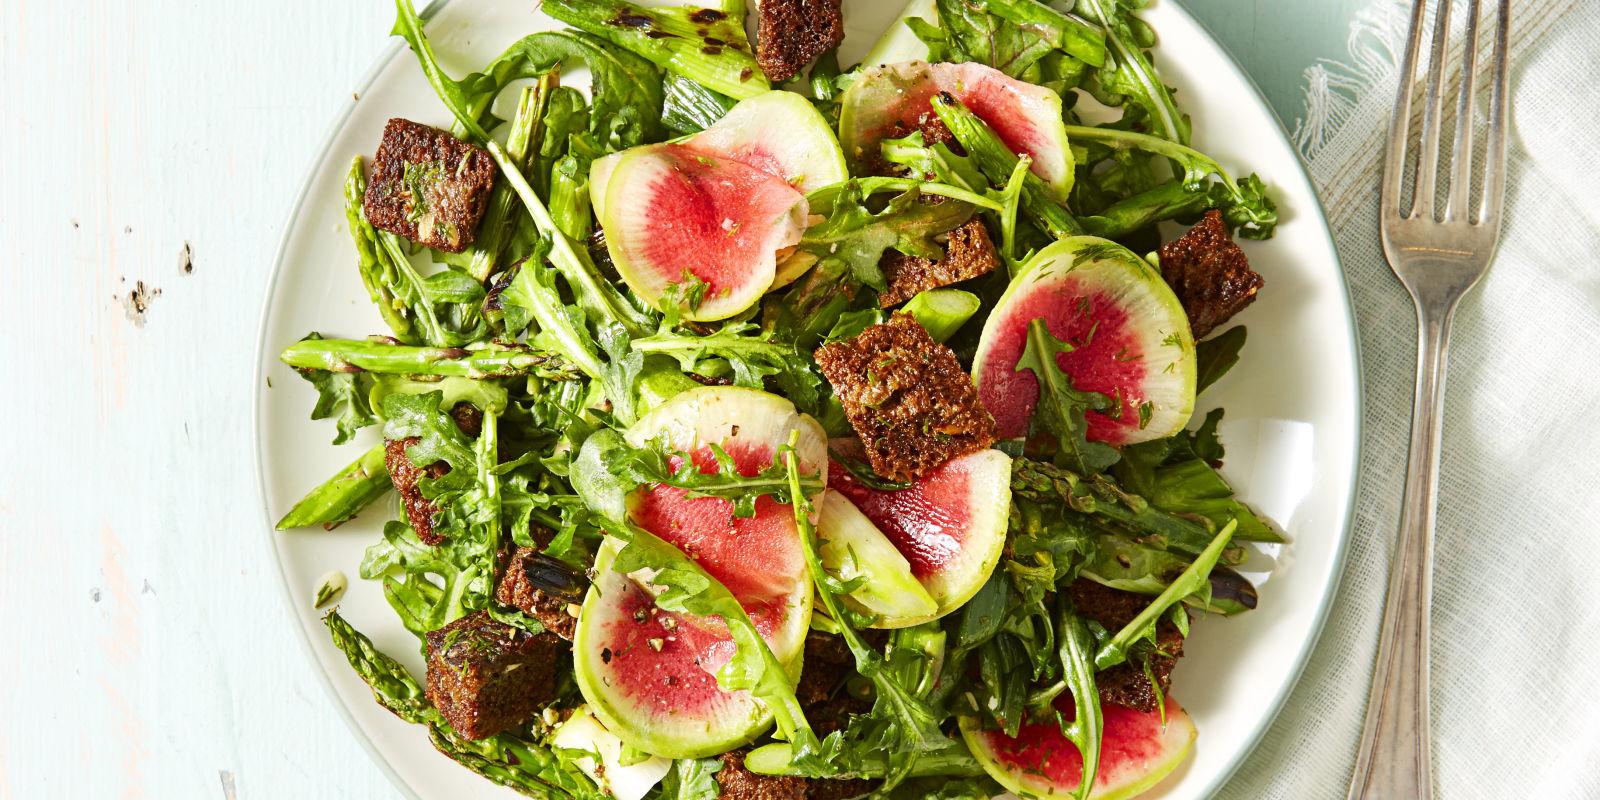 Garden Greens And Pumpernickel Panzanella Recipe   How To Make Panzanella    GoodHousekeeping.com